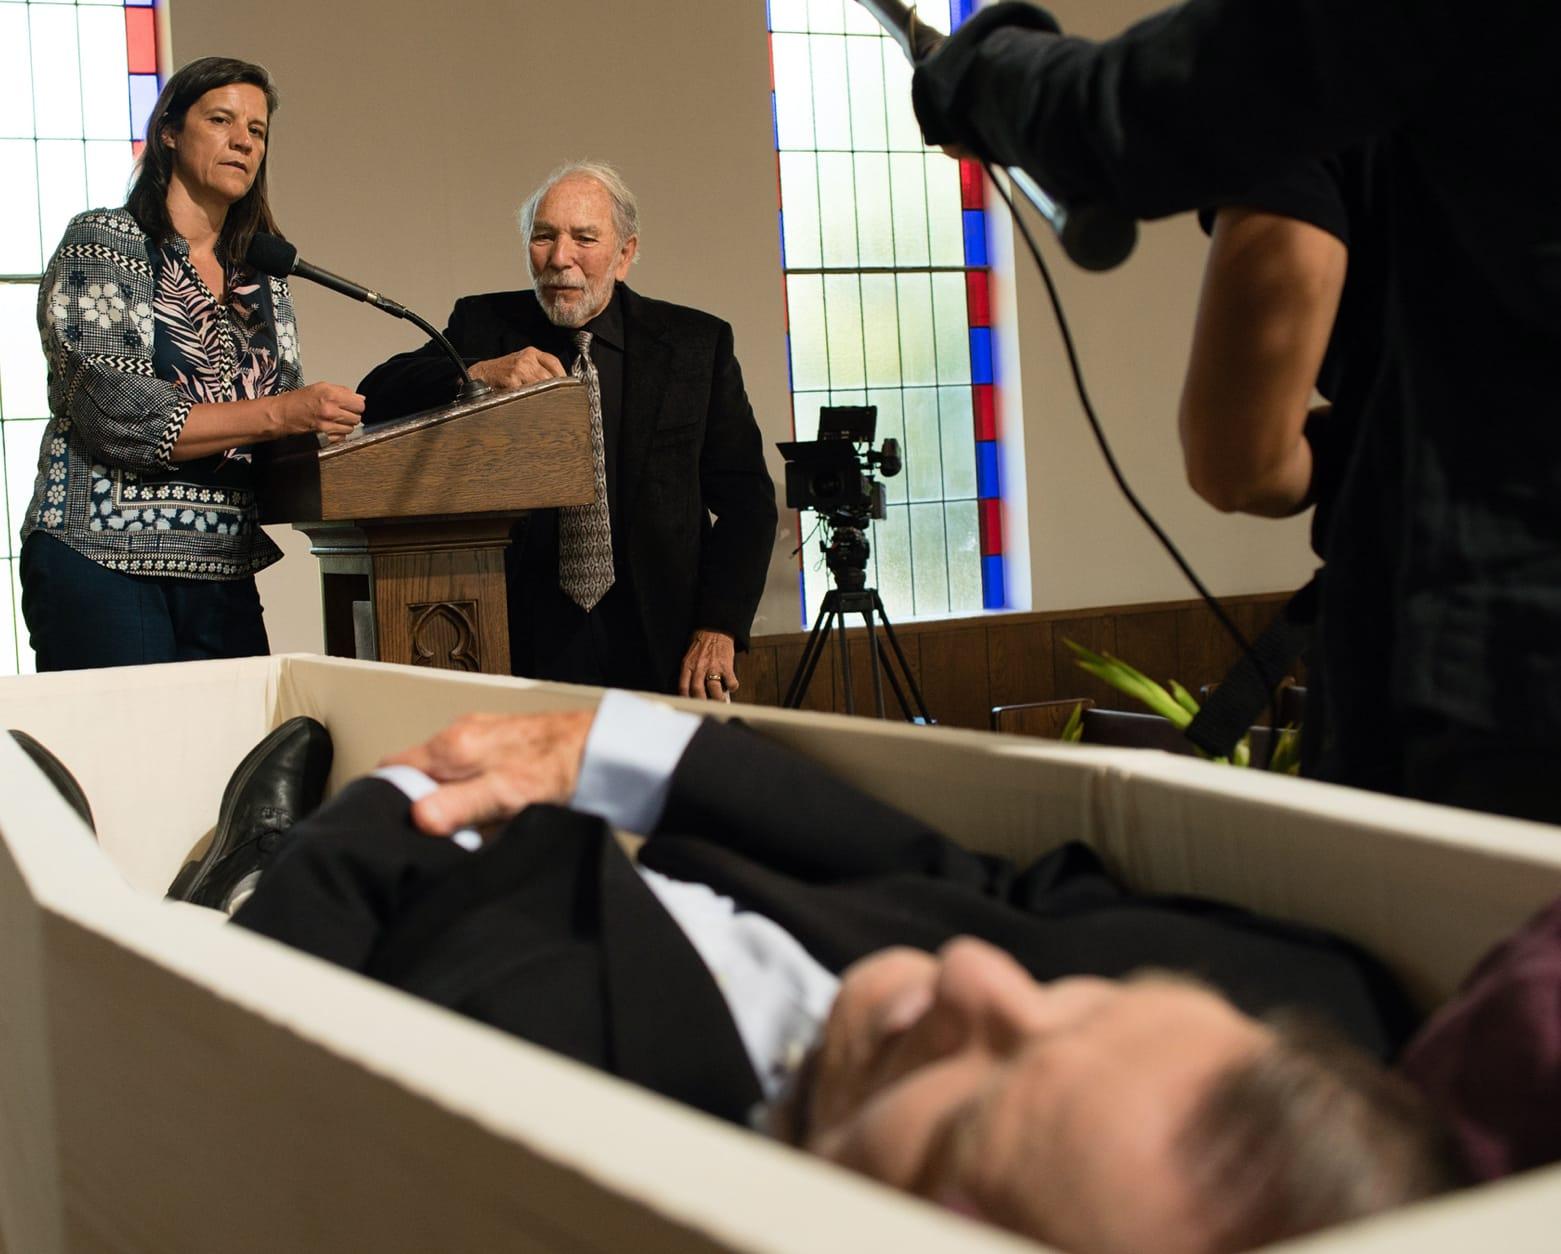 Kirsten Johnson surveys Dick Johnson in his casket